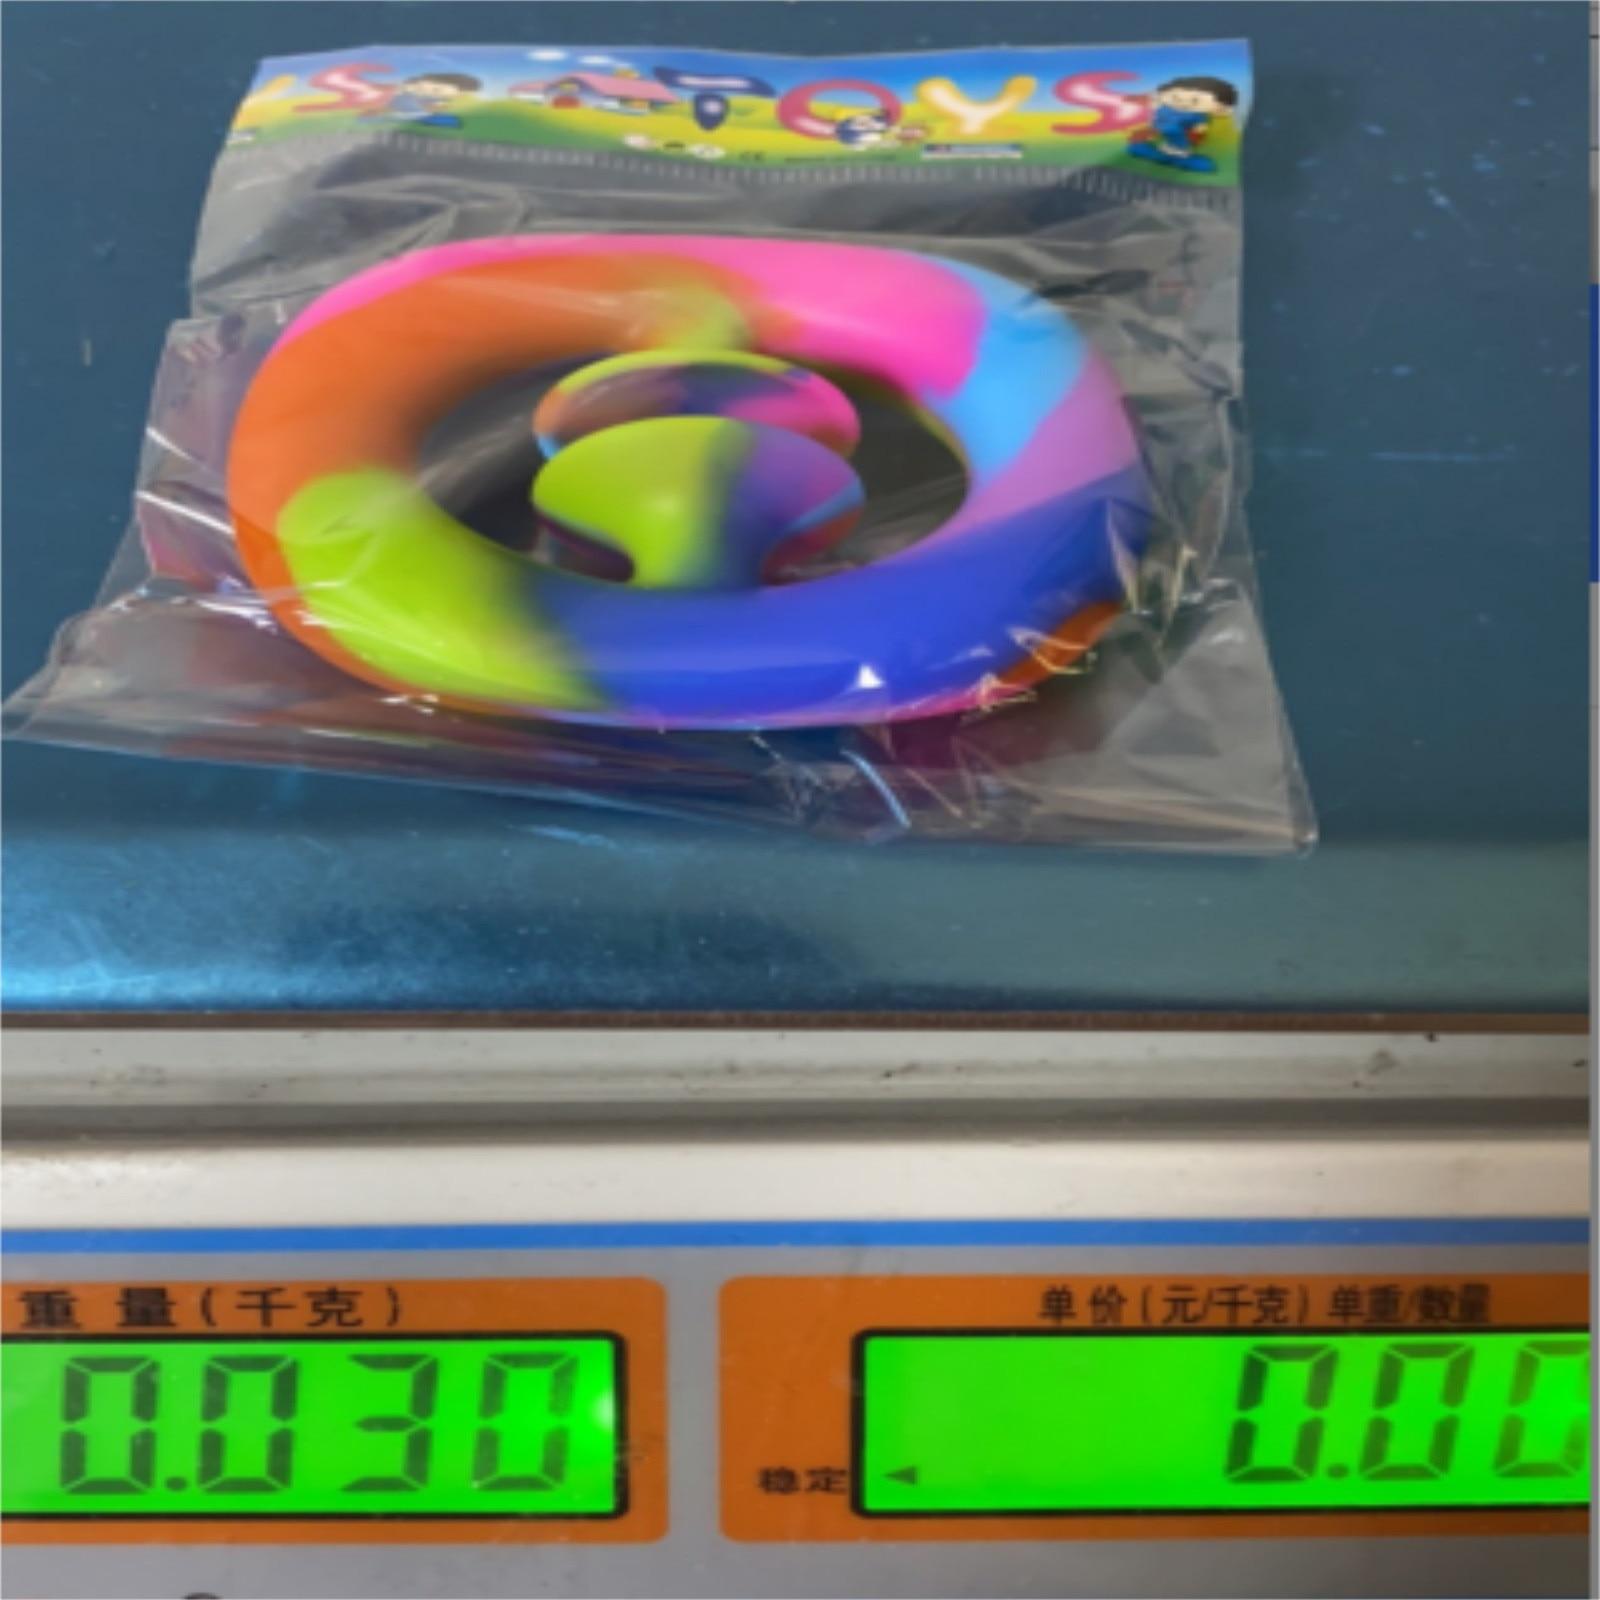 Toys Fidget-Toy Autism Finger Anti-Stress Funny Noise-Sensory Snapperz Adult Hand-Grip img5